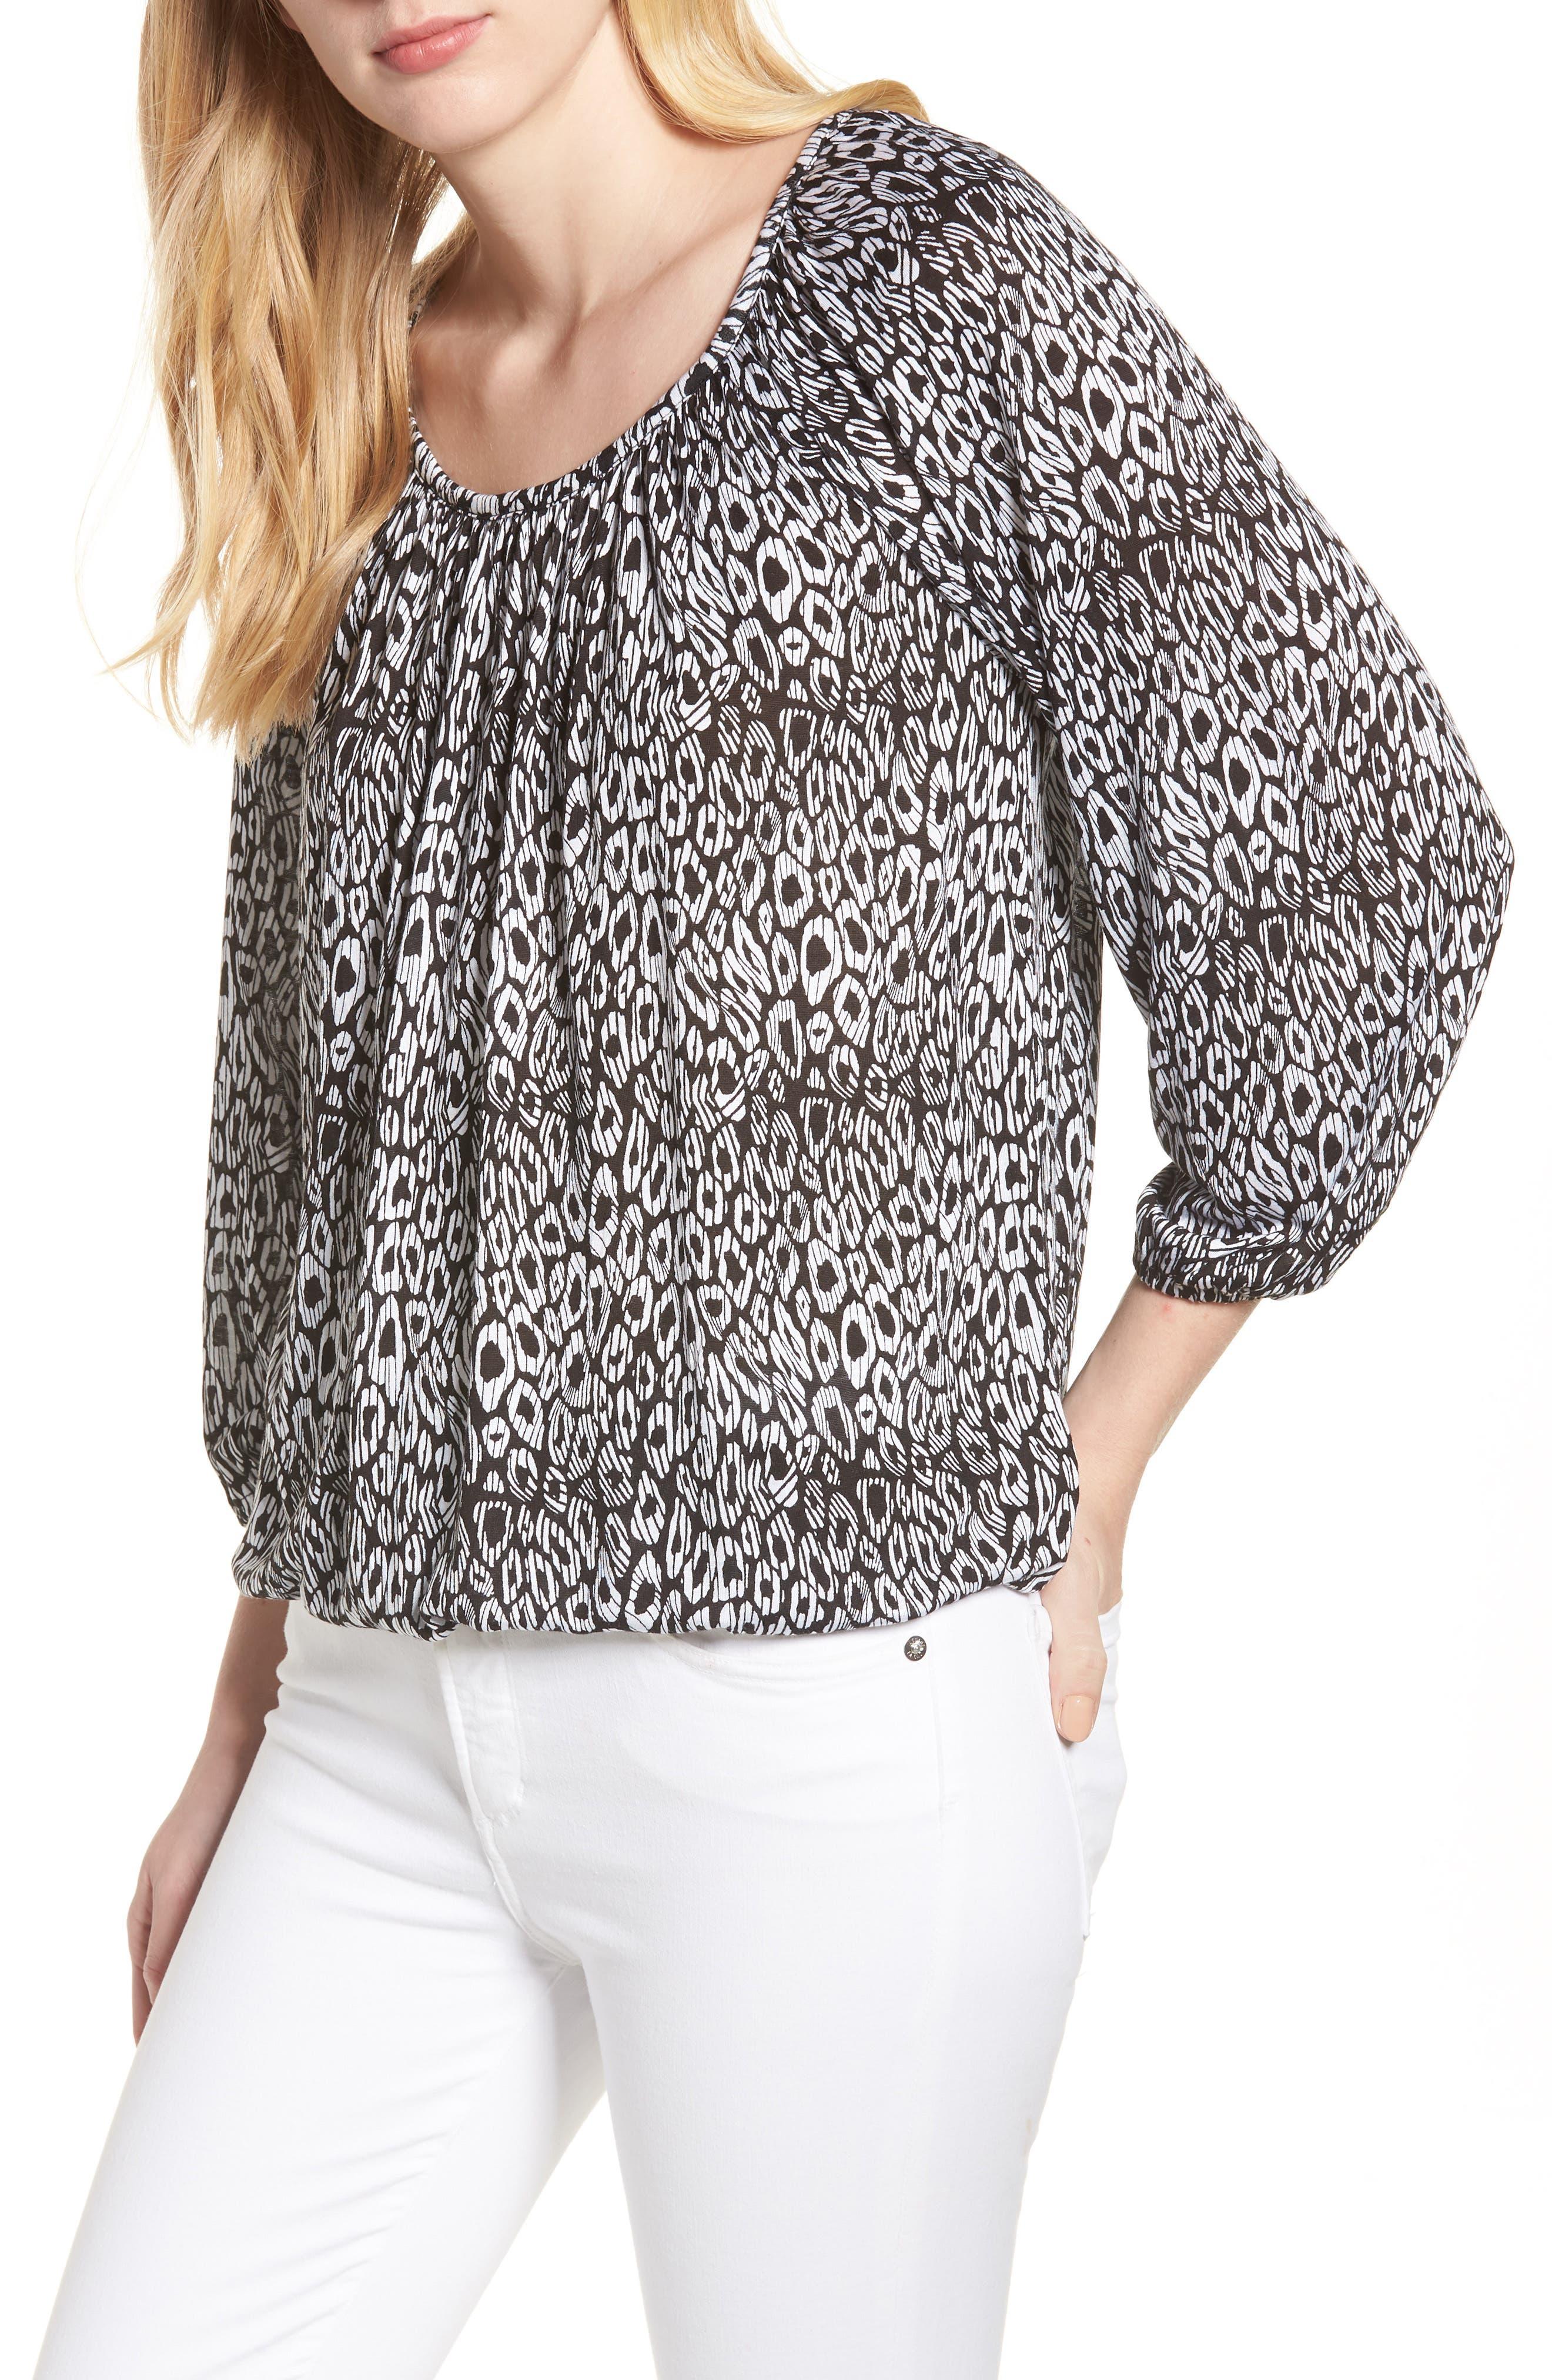 Wavy Leopard Stripe Peasant Top,                         Main,                         color, Black/ White